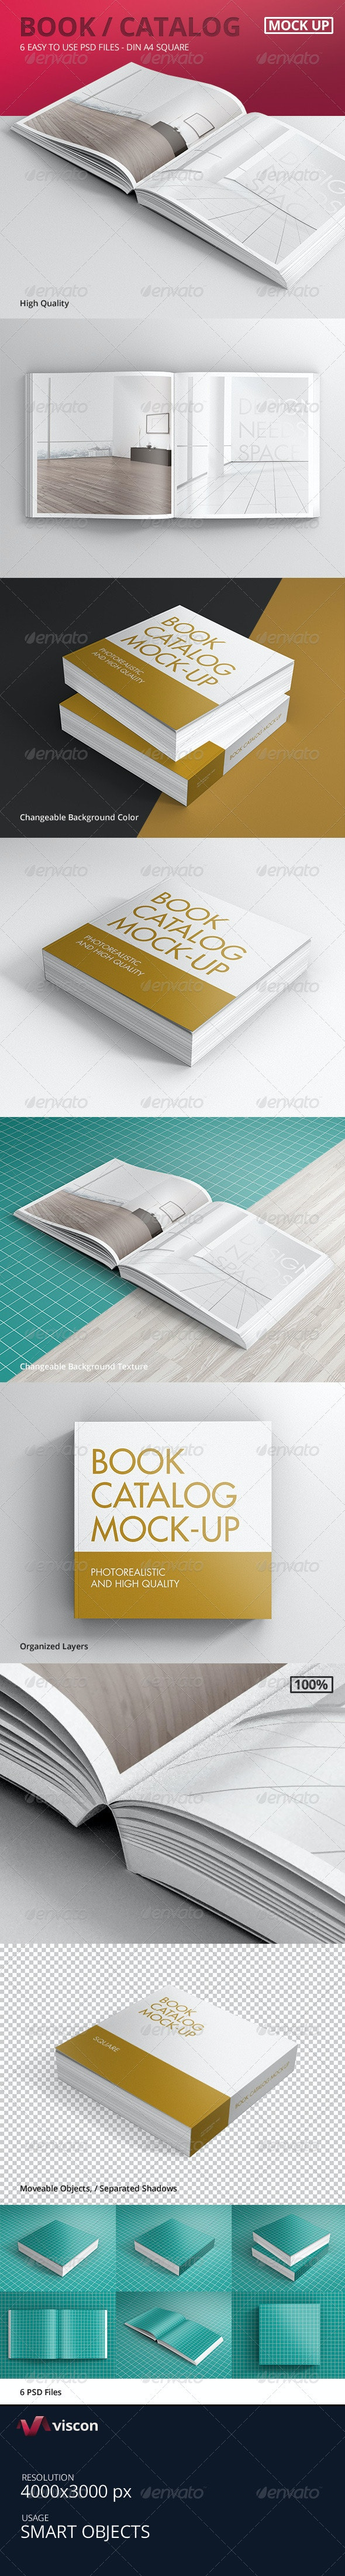 Book / Catalog Mock-Ups Square - Books Print